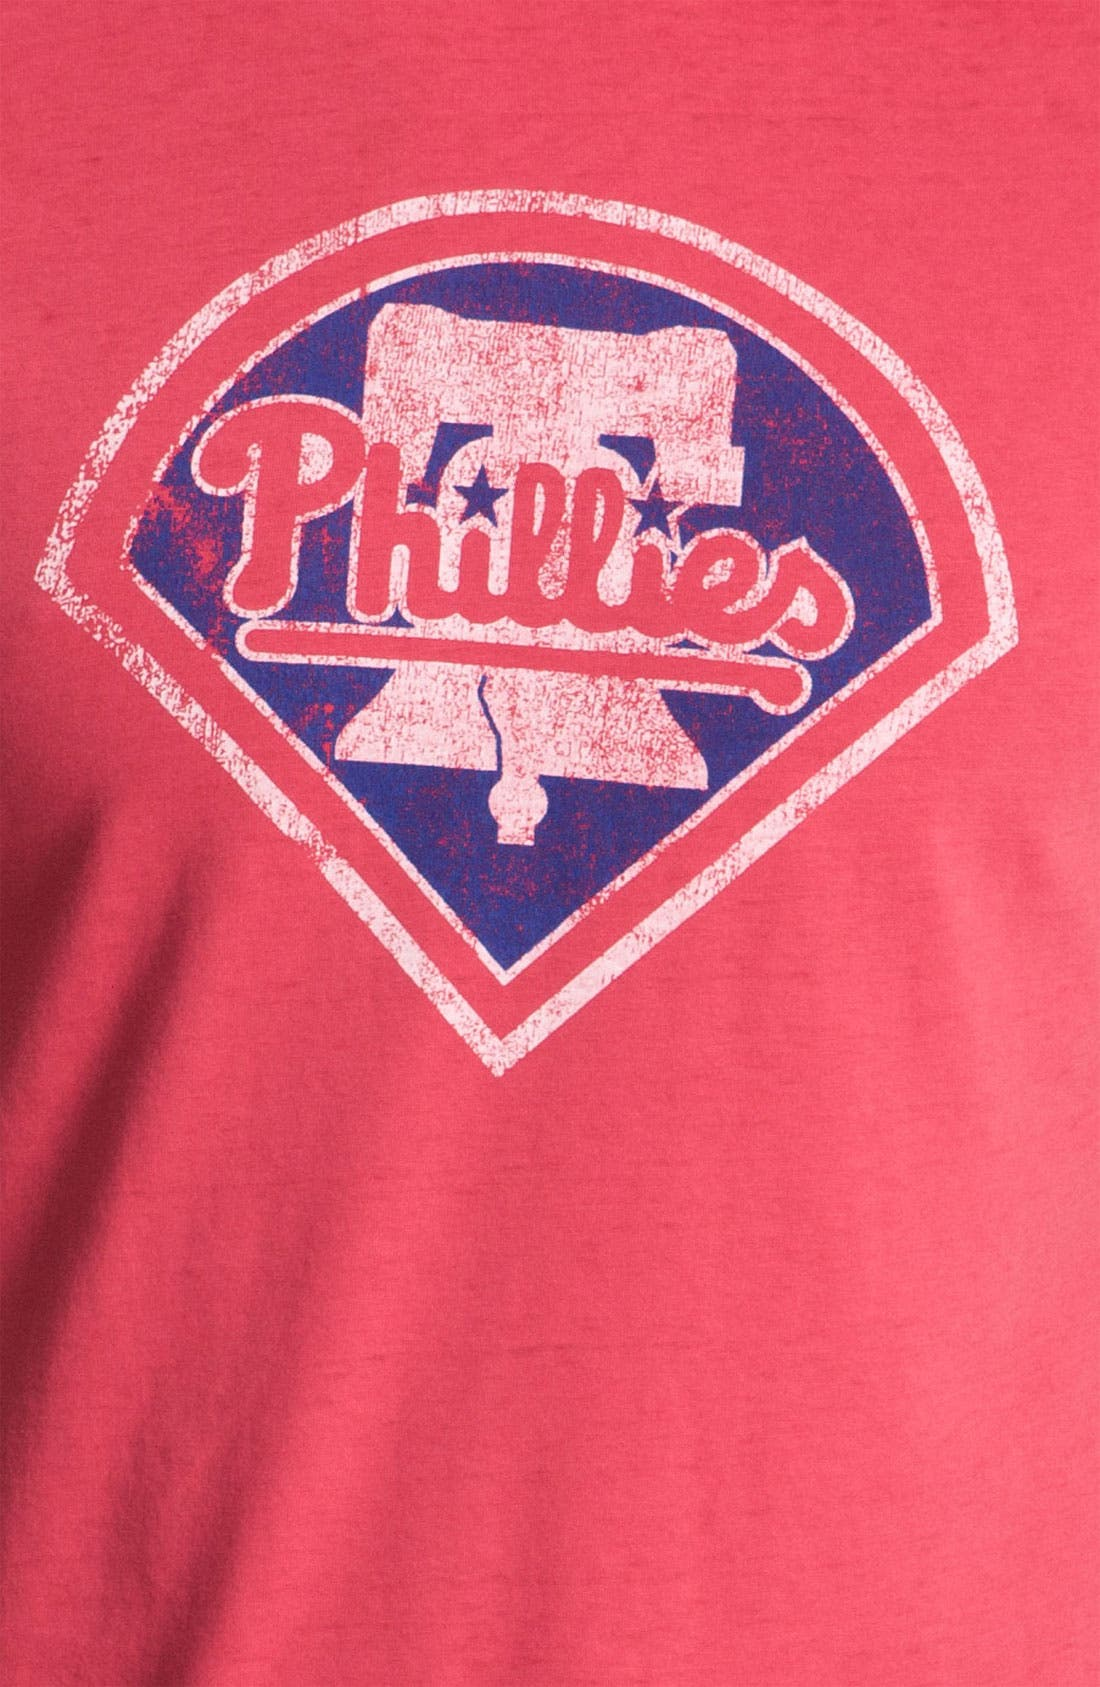 Alternate Image 3  - Red Jacket 'Phillies - Greenwood' T-Shirt